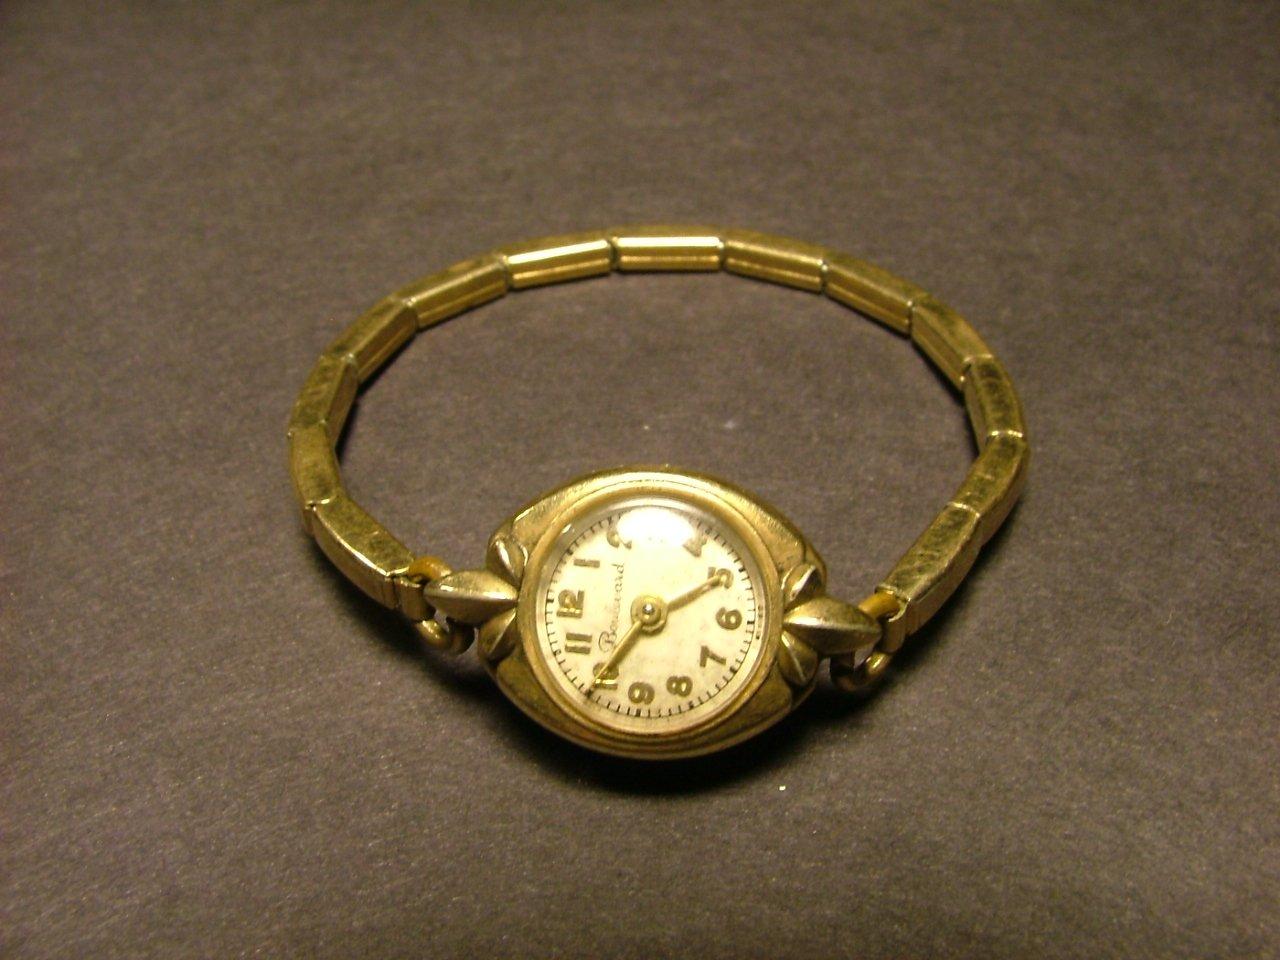 Boulevard Women's Watch, Mead Co, Original Bracelet Band c.1940